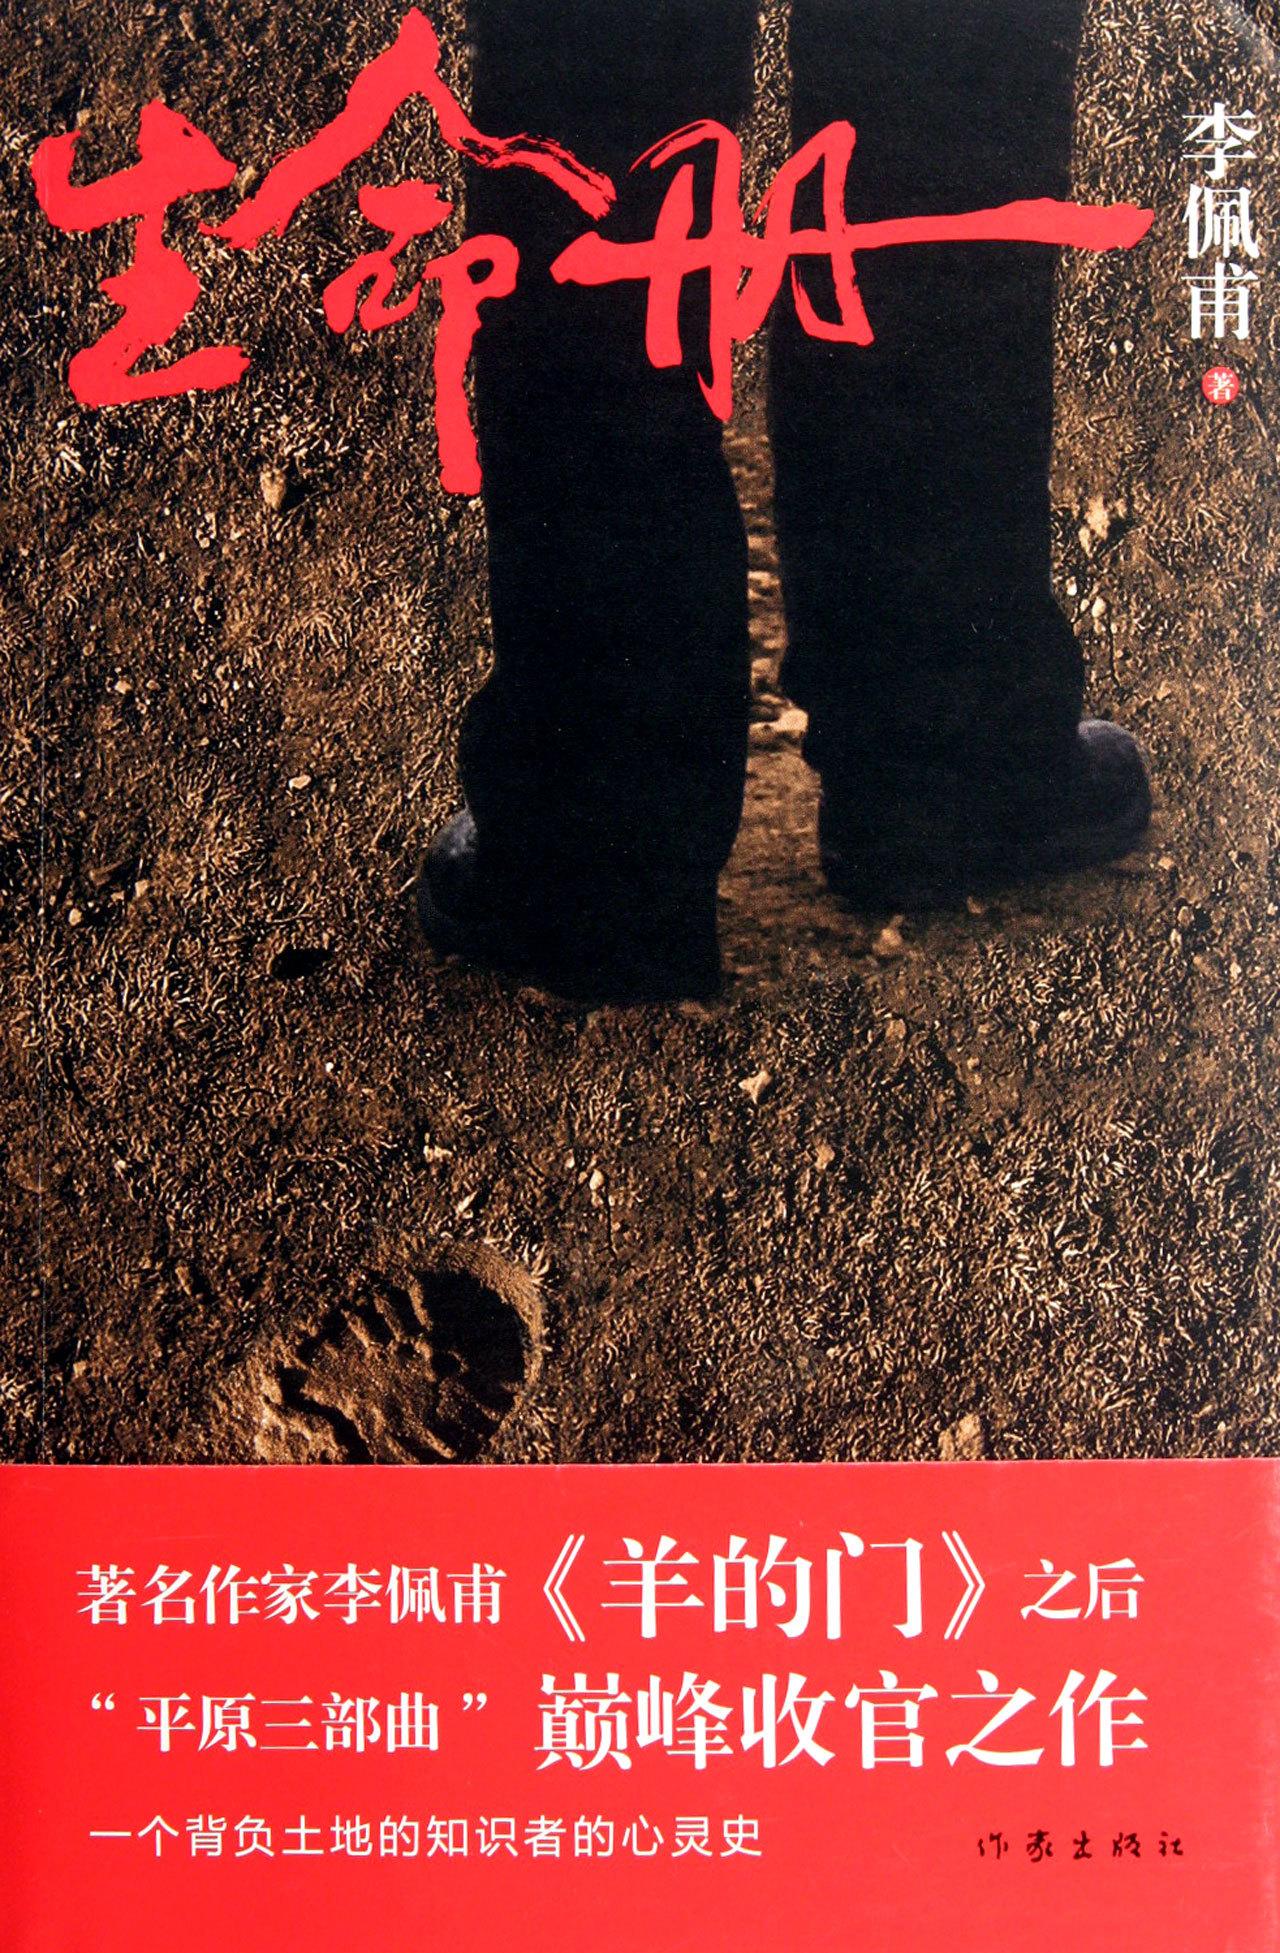 The Book of Life (Chinese Edition)生命册  by  Li Peifu李佩甫